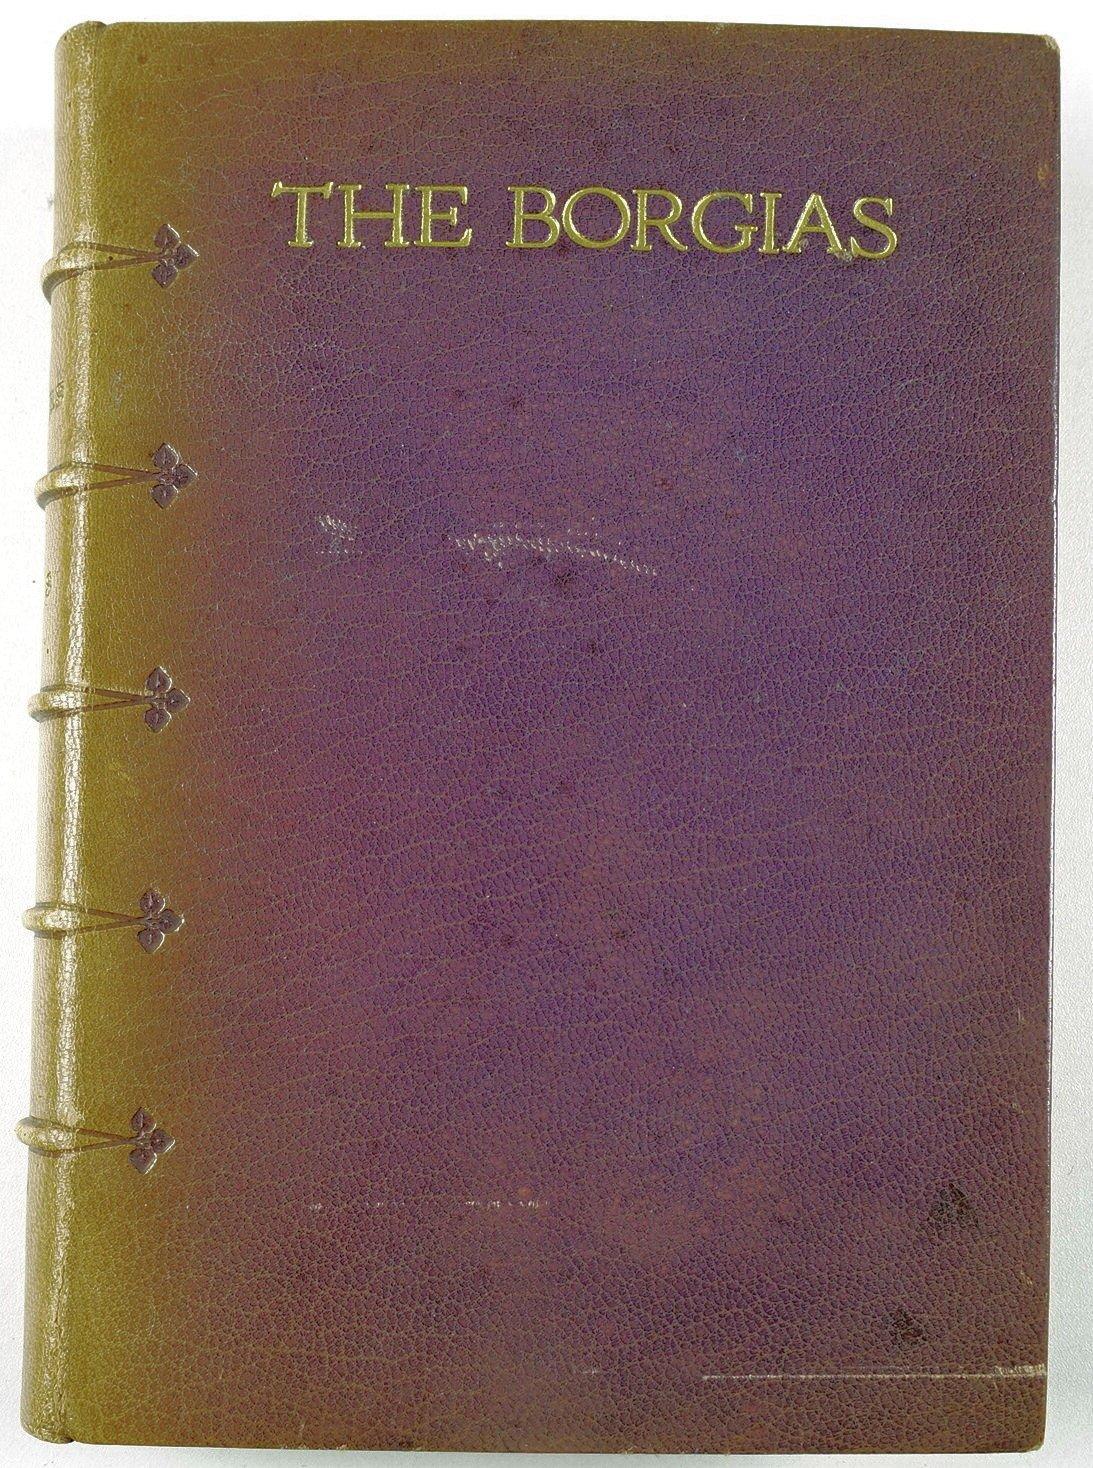 DUMAS, ALEXANDRE - The Borgias [Hatchards Binding]